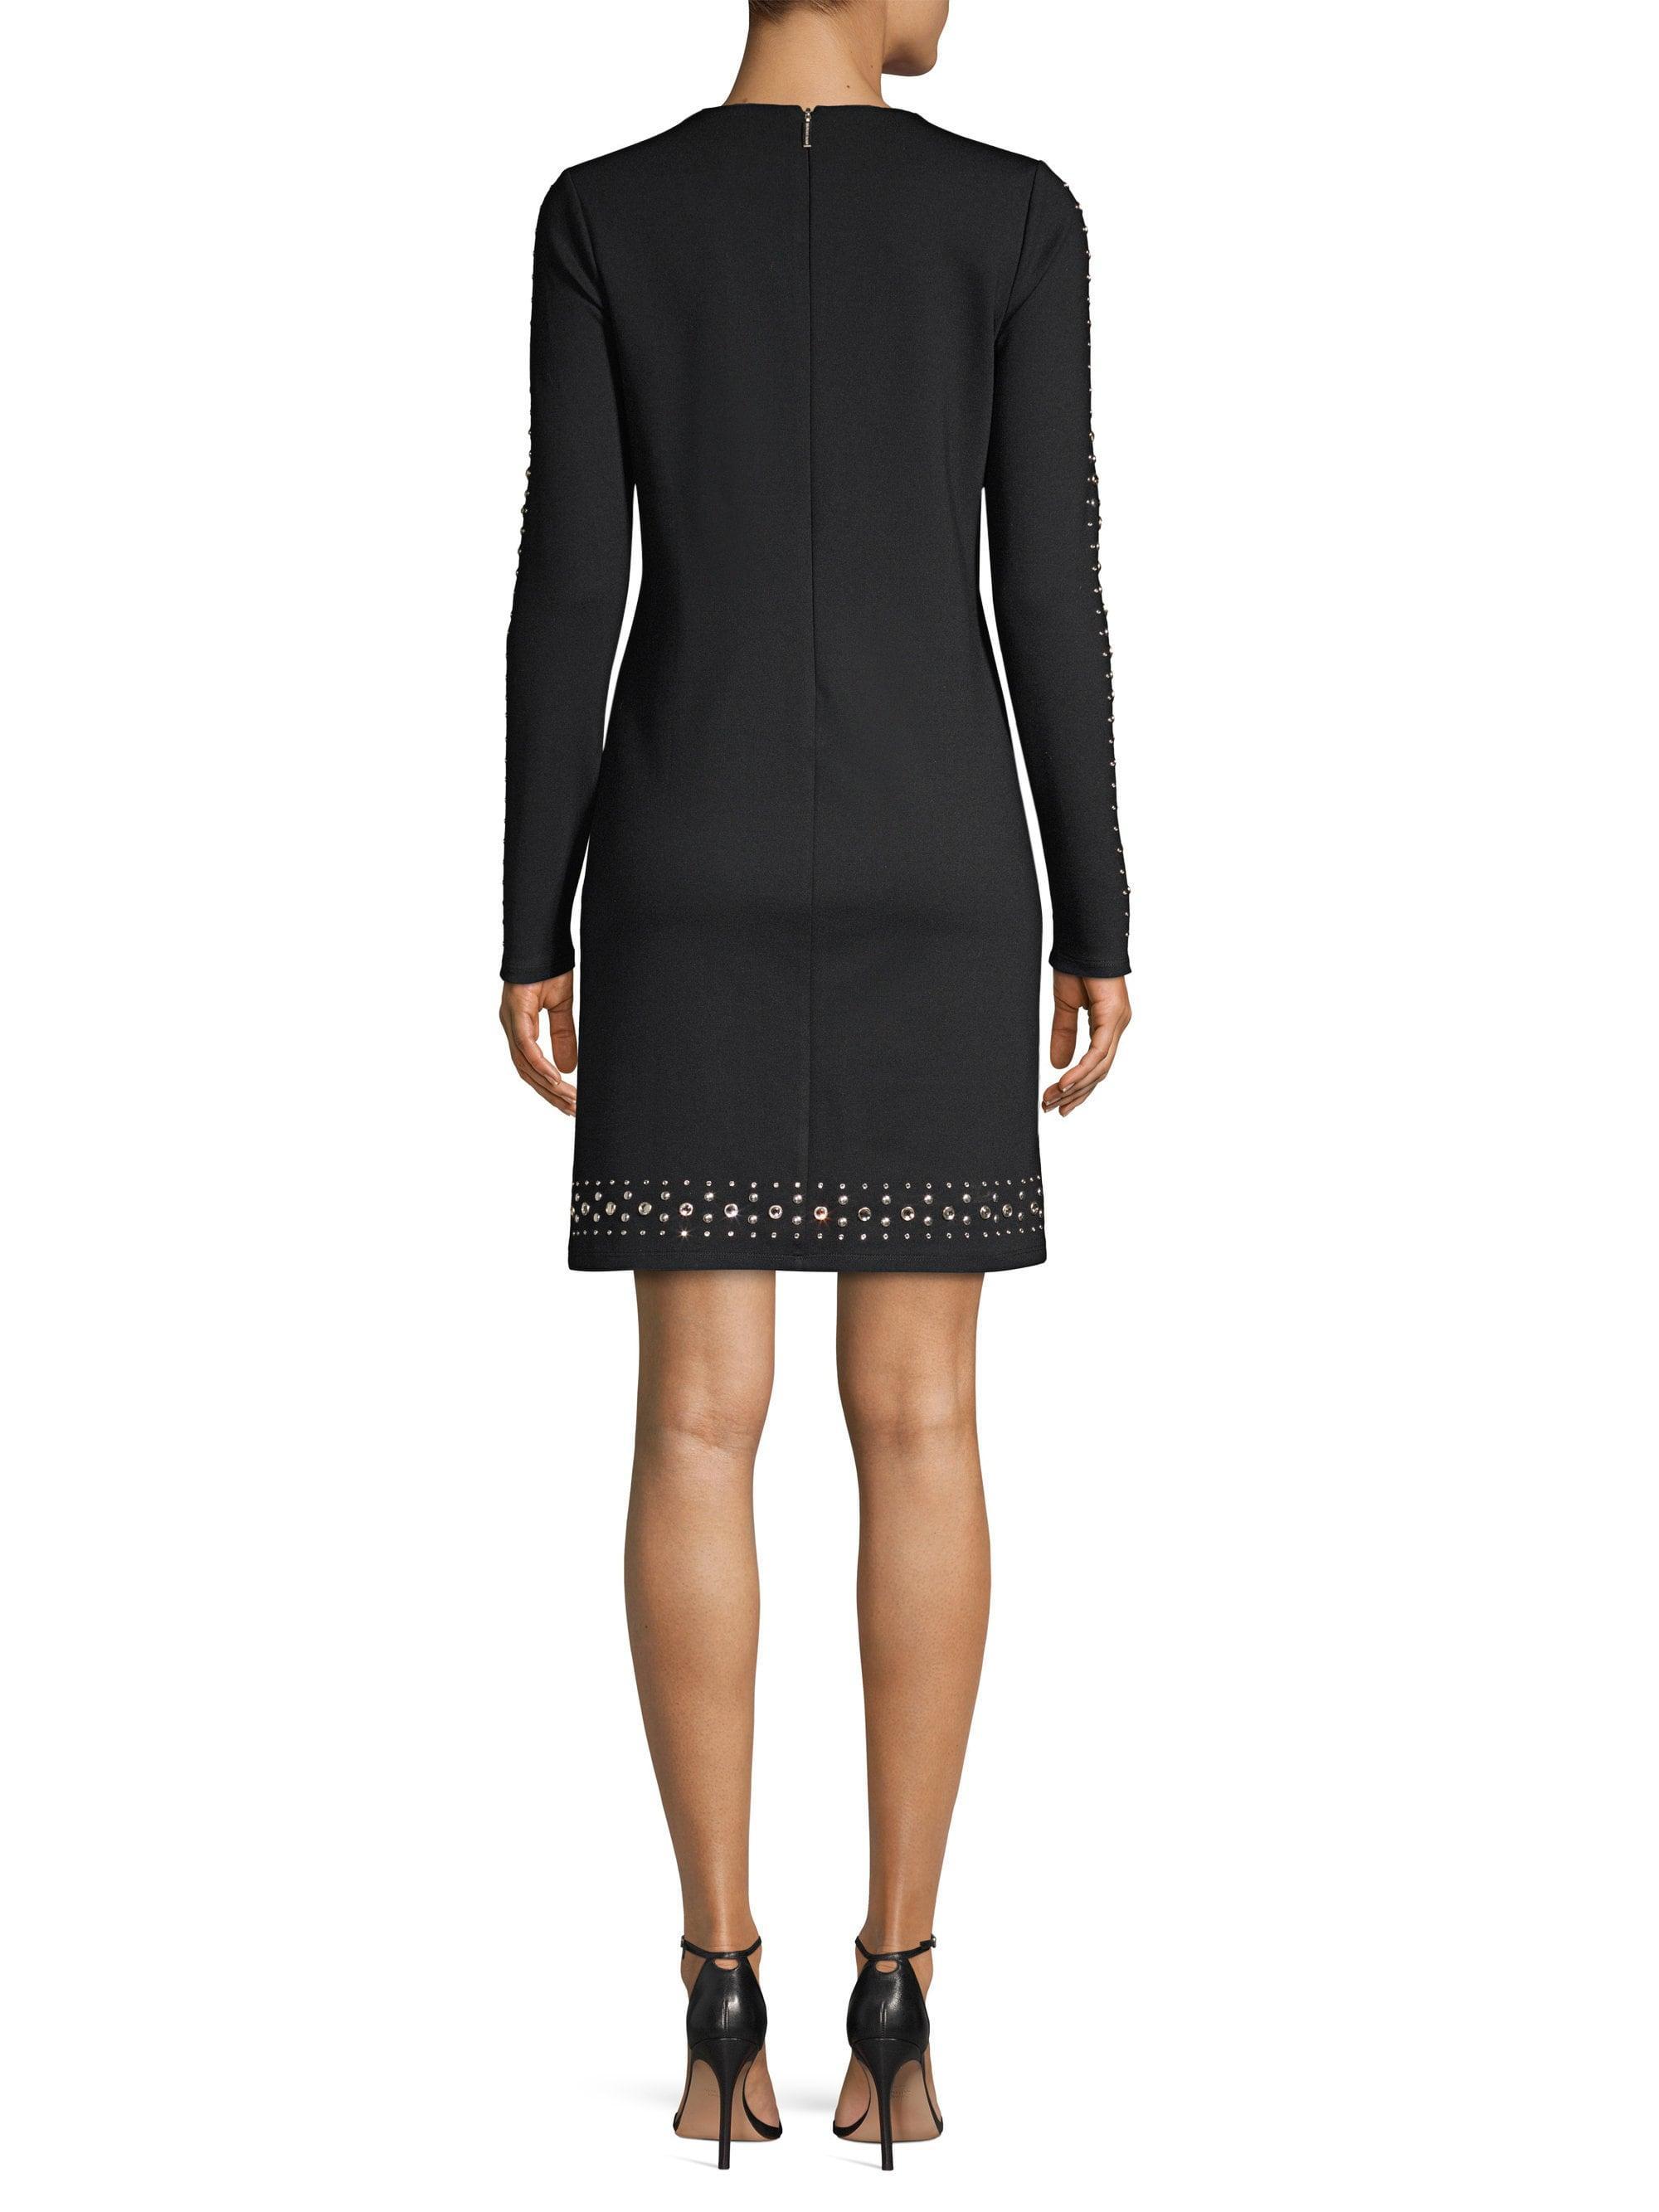 7856d7f36f43 Lyst - MICHAEL Michael Kors Women s Embellished Solid Ponte Shift Dress -  Black - Size Xs in Black